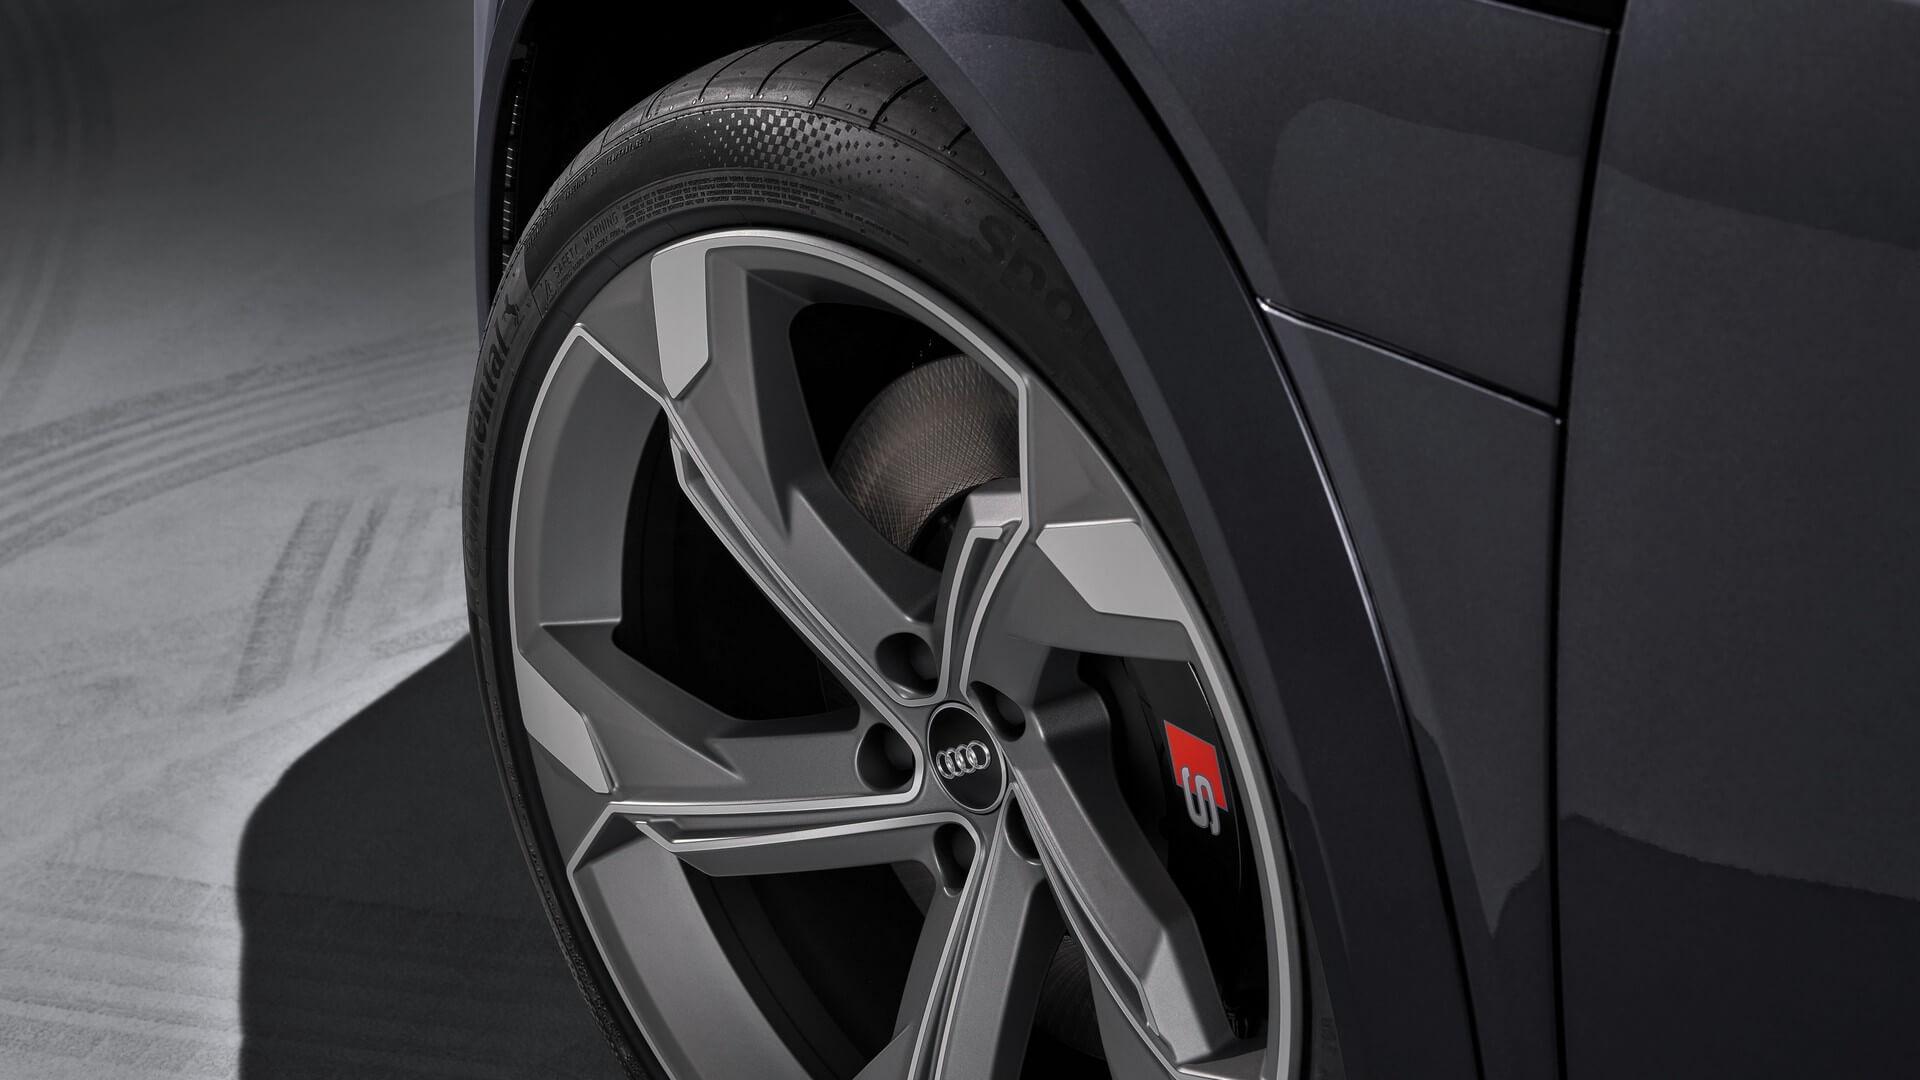 Audi-E-Tron-S-and-E-Tron-S-Sportback-2020-89